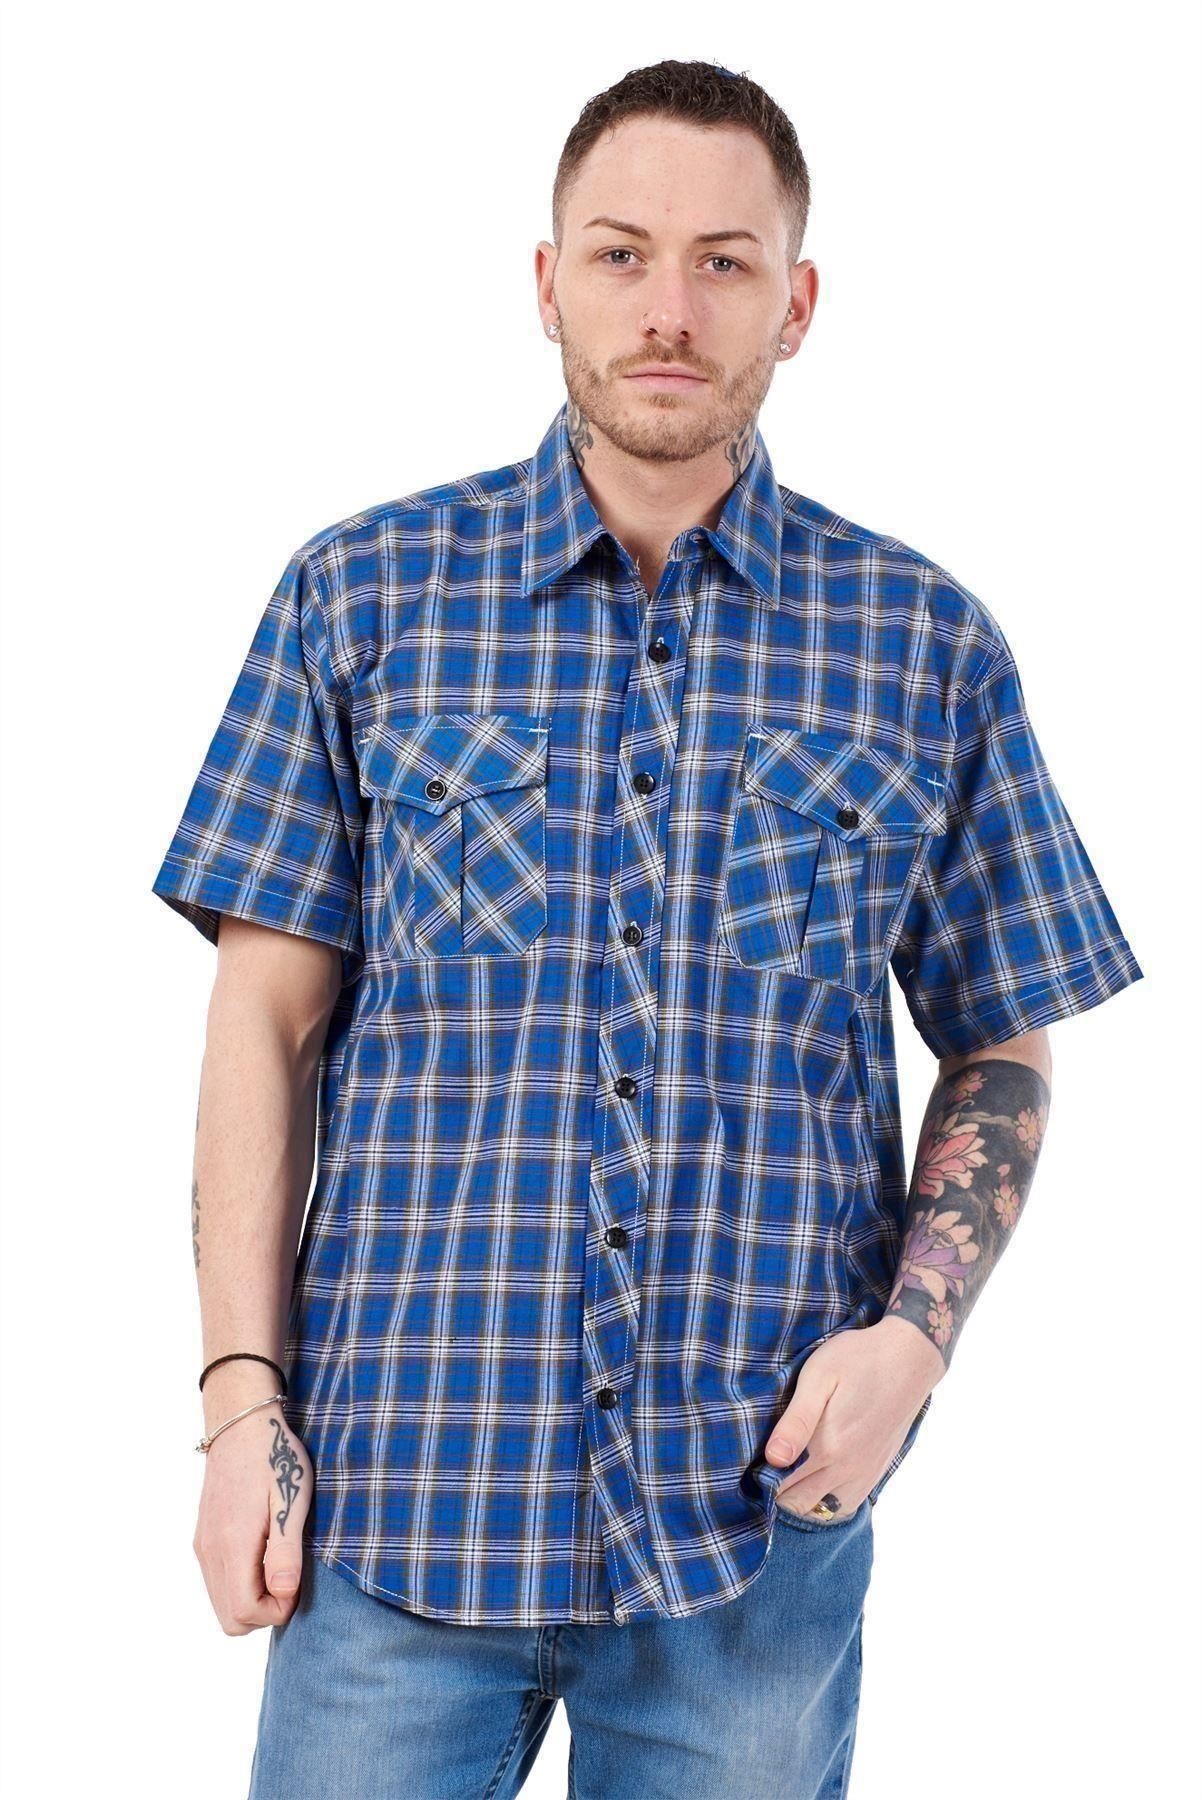 Mens-Regular-Big-Size-Shirts-Checked-Cotton-Blend-Casual-Short-Sleeve-Blue-M-5XL thumbnail 24